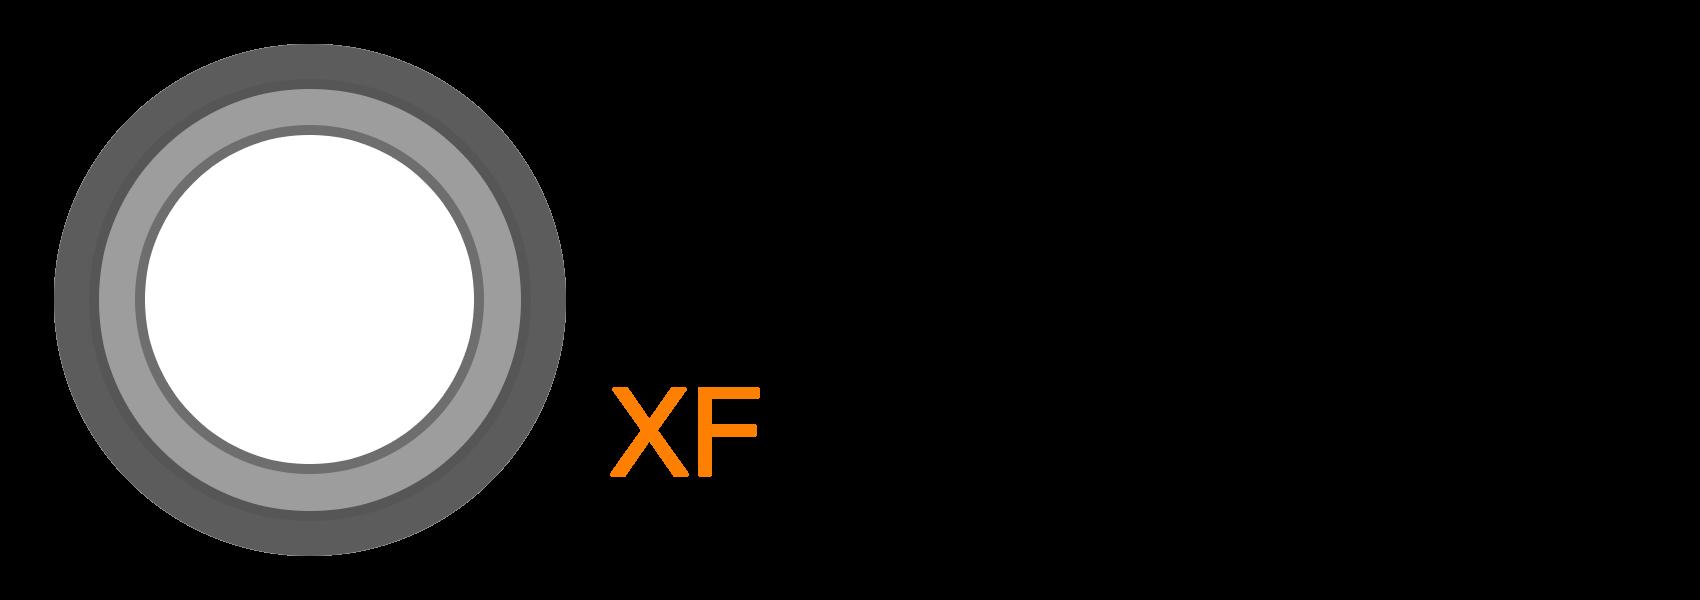 XFAssistiveTouch